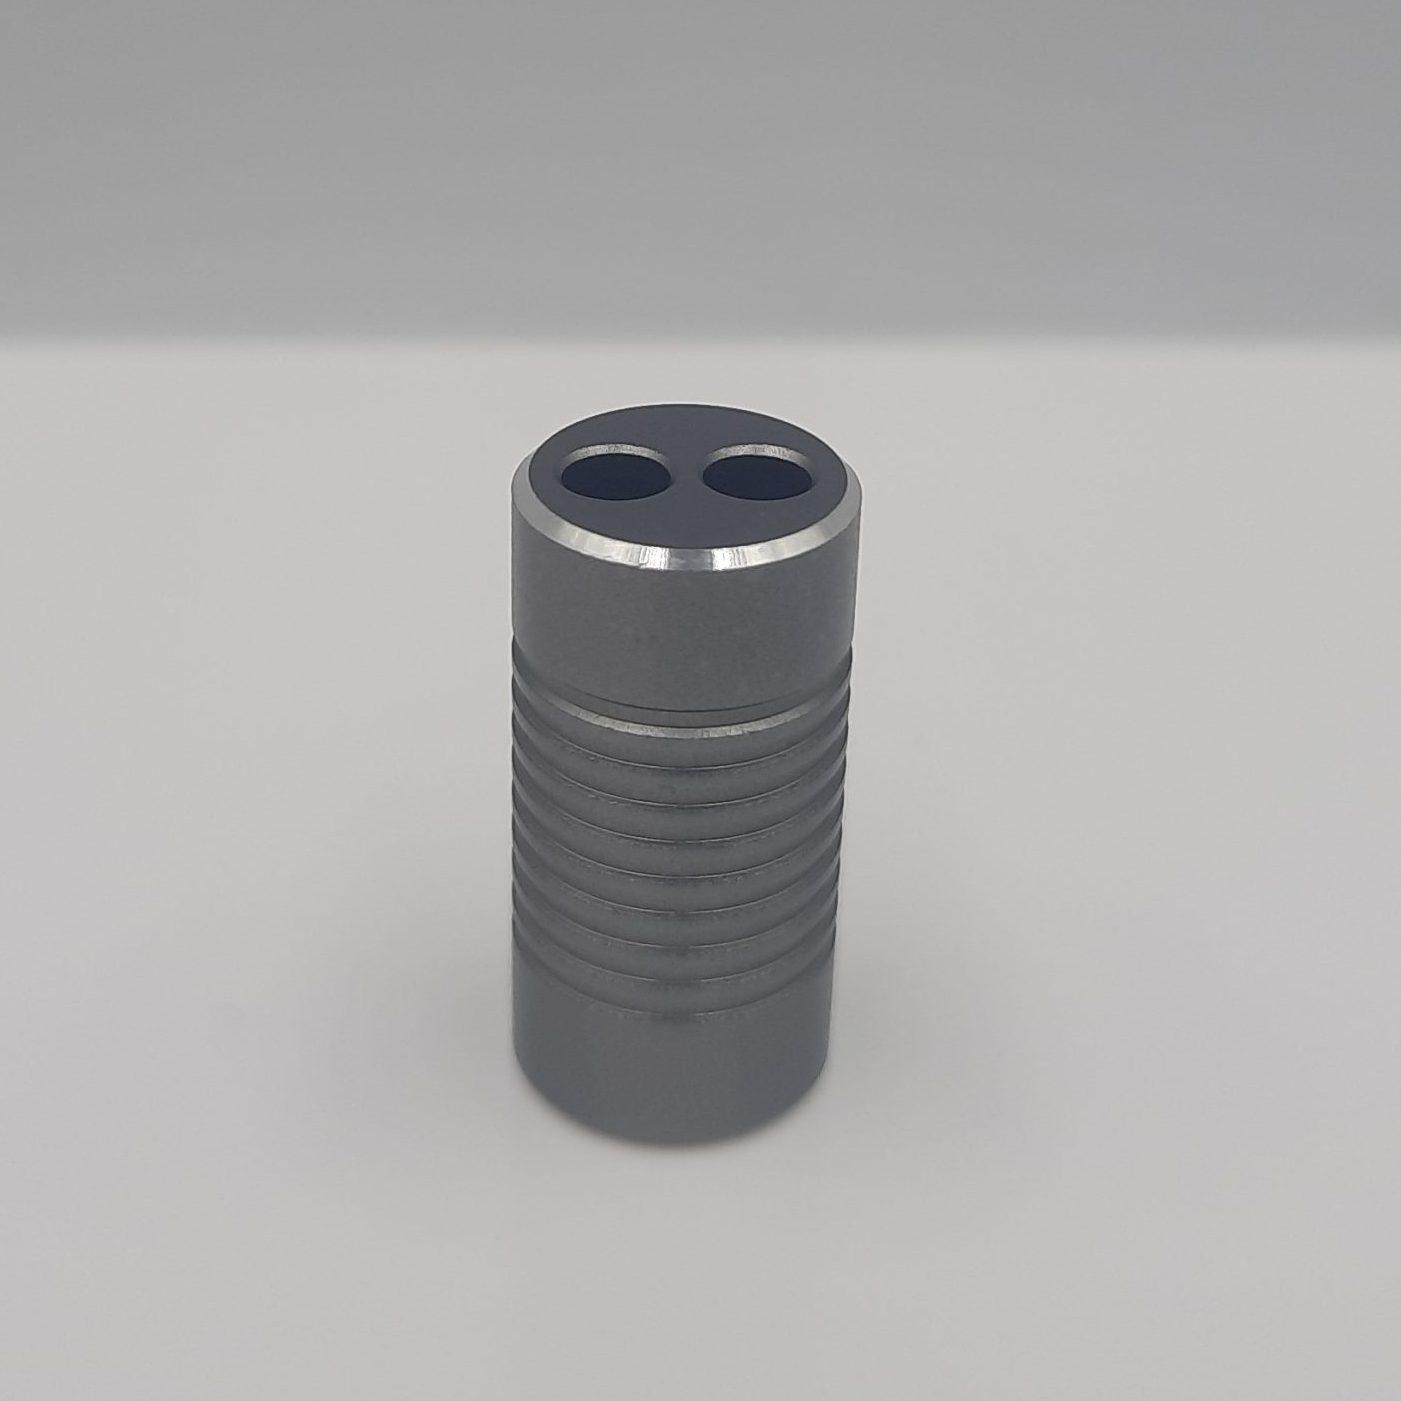 Eidolic E-SX6 Ultracompact Y-Splitter